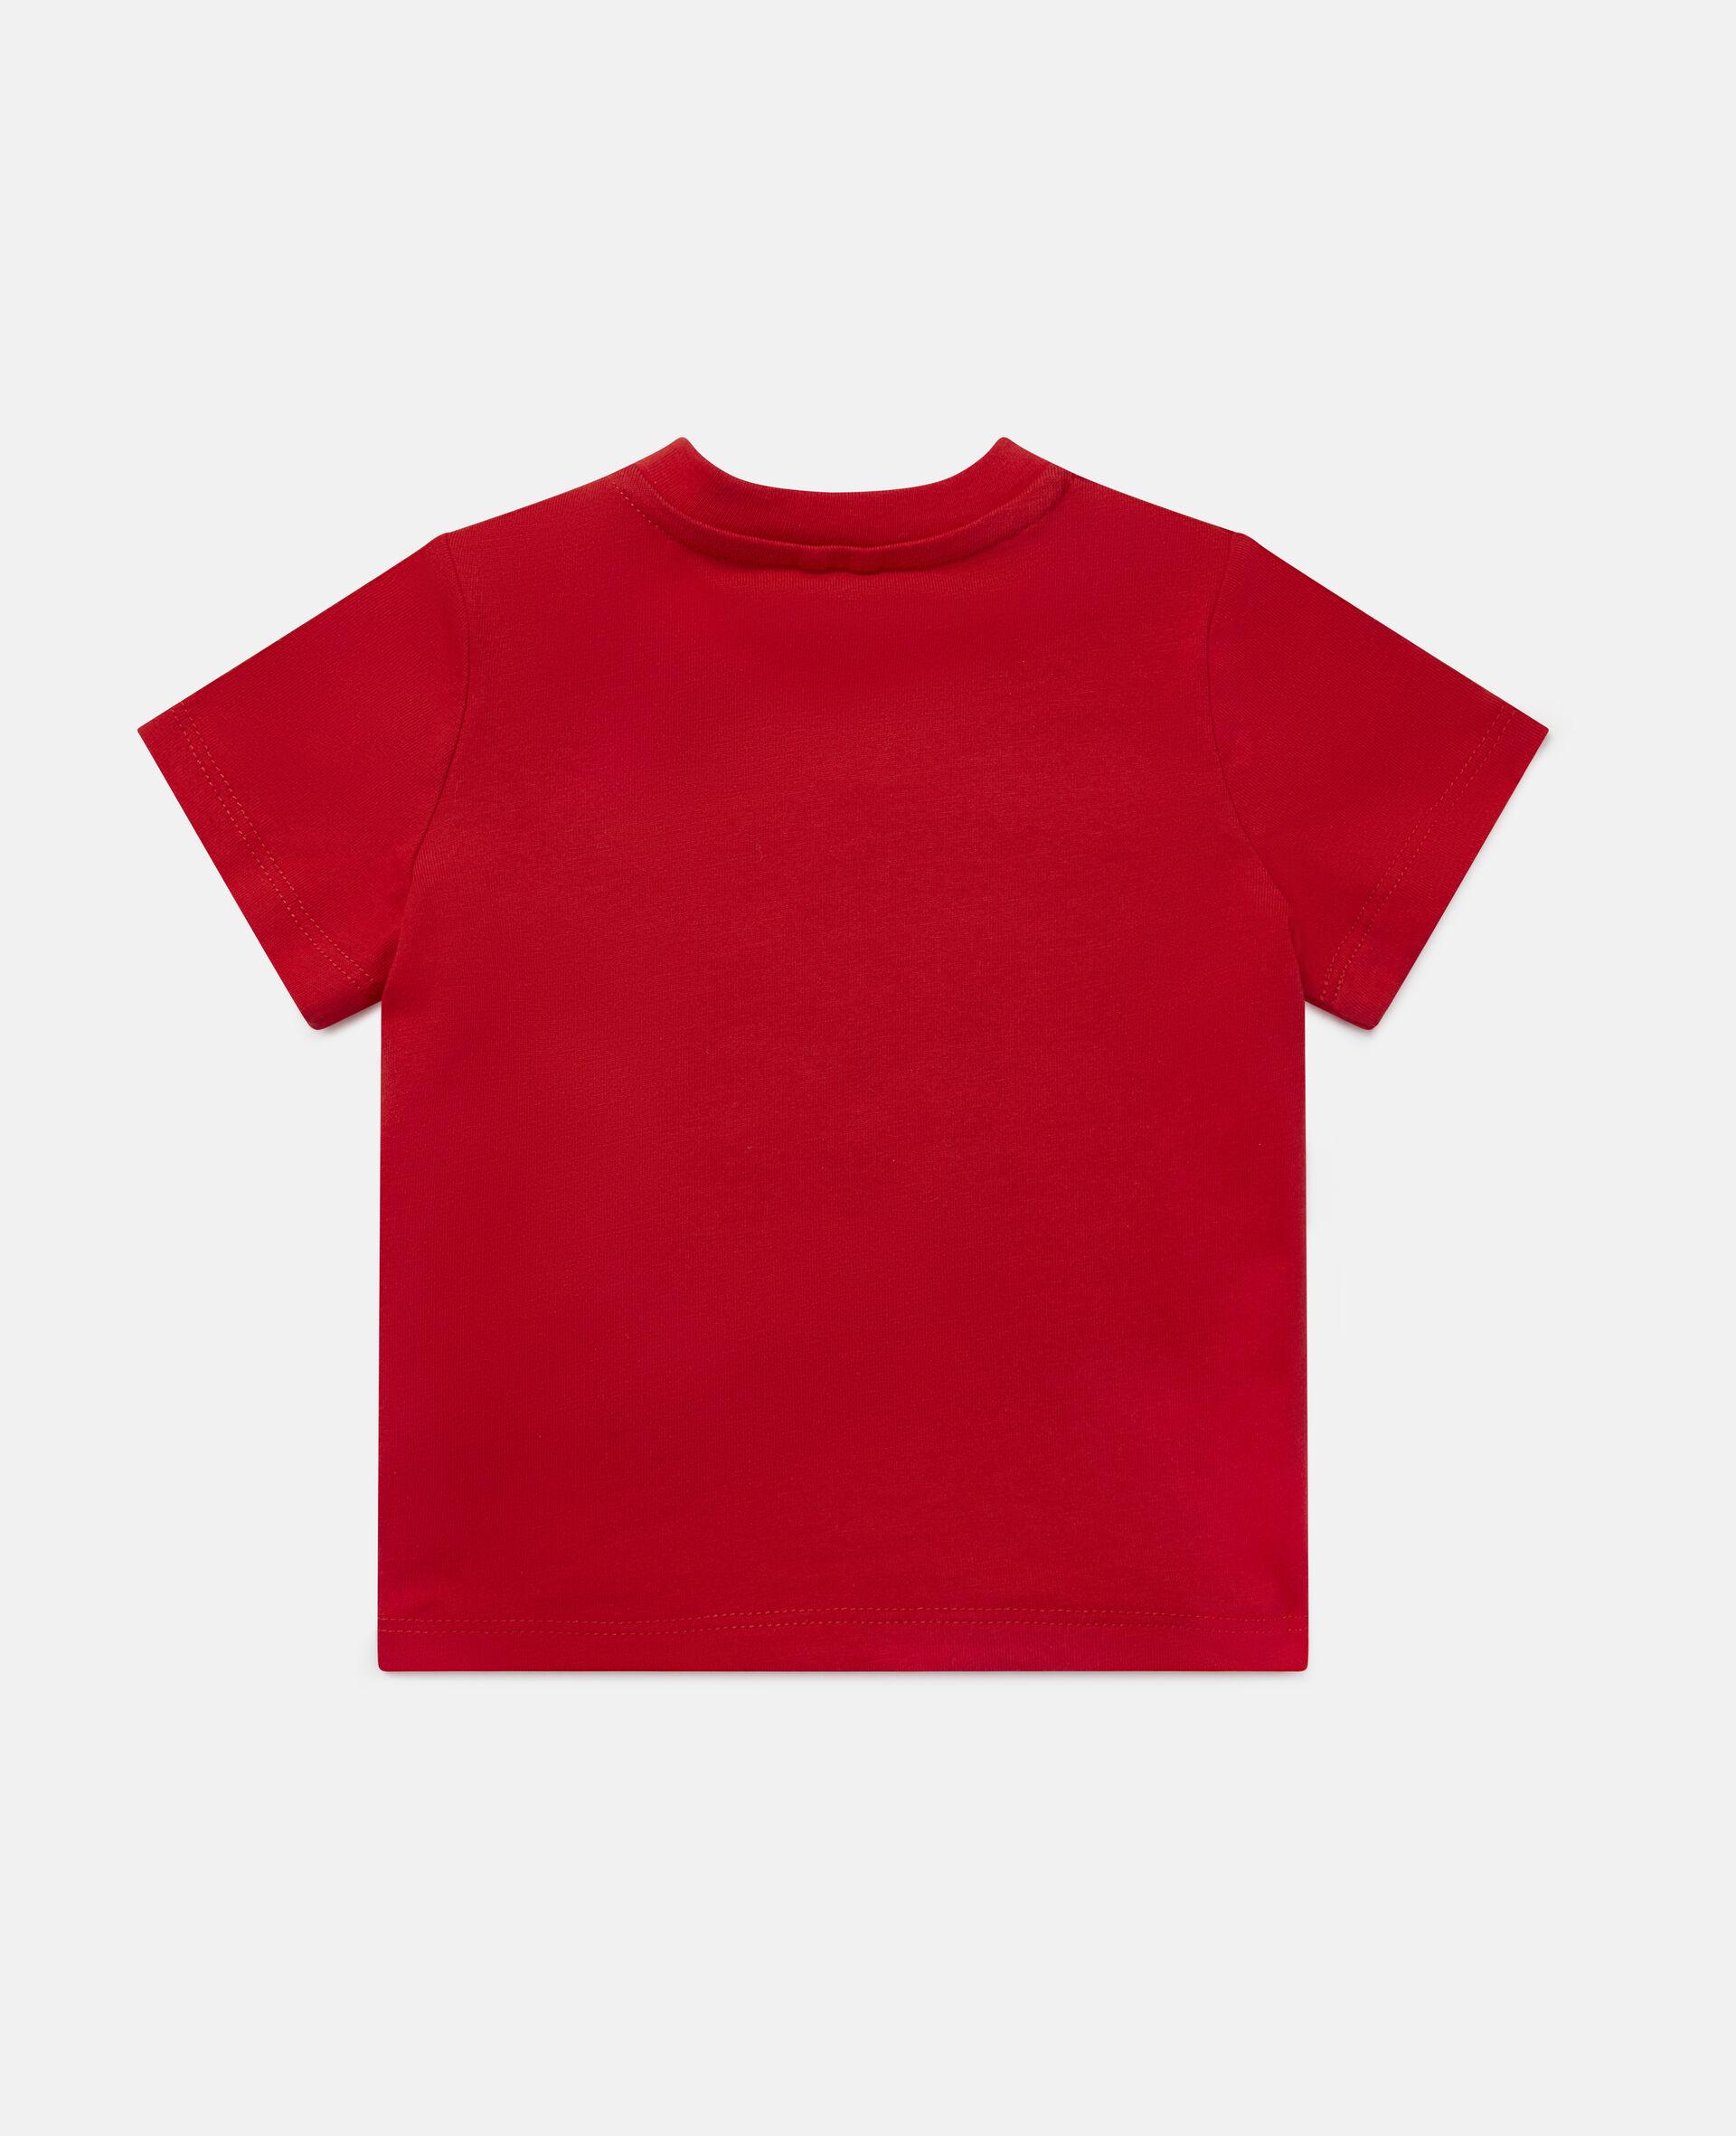 Baumwoll-T-Shirt mit Skateboardmotiv-Rot-large image number 3